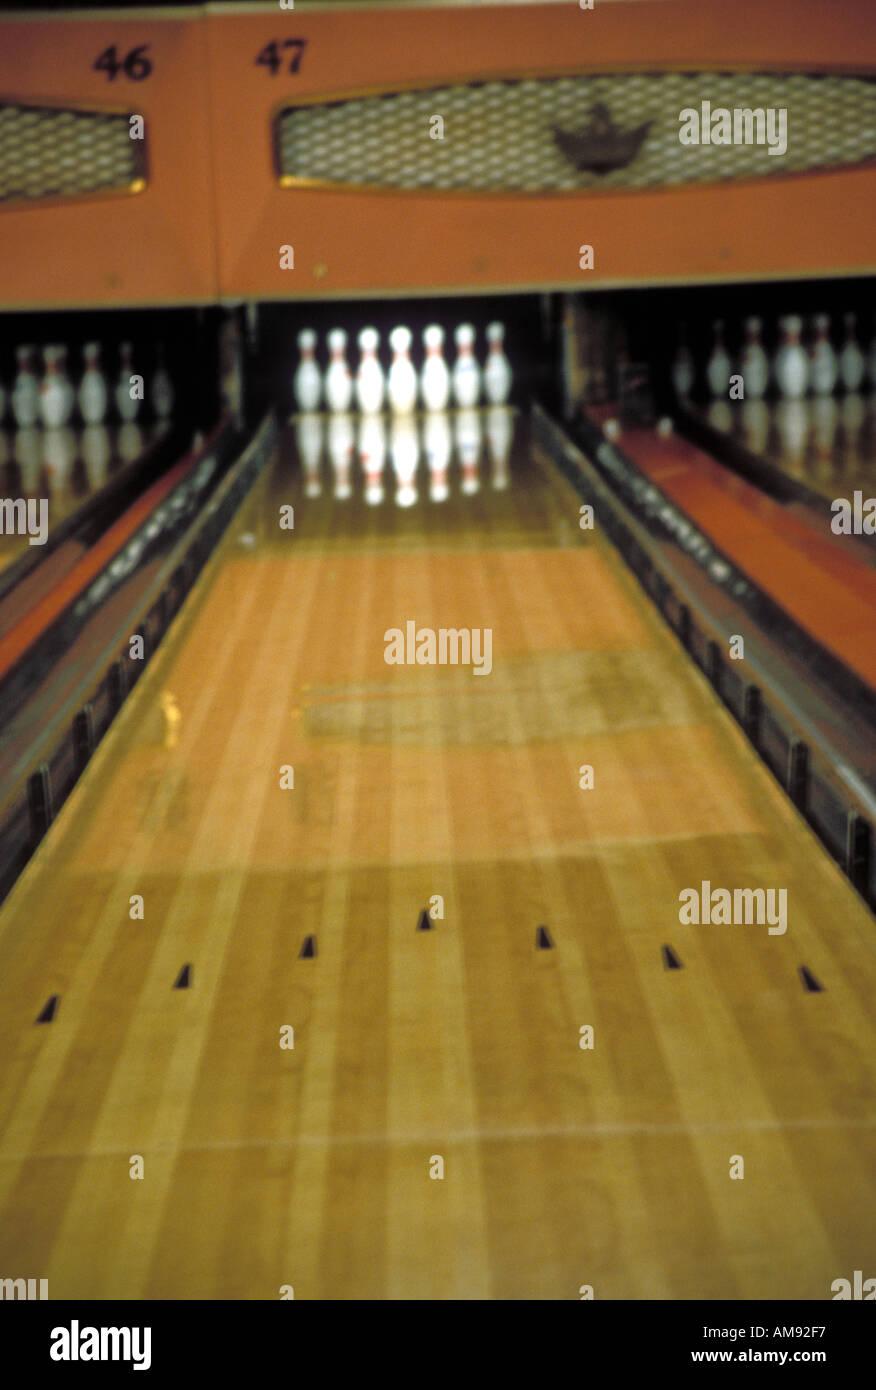 Bowling Lane Stock Photo: 1348342 - Alamy